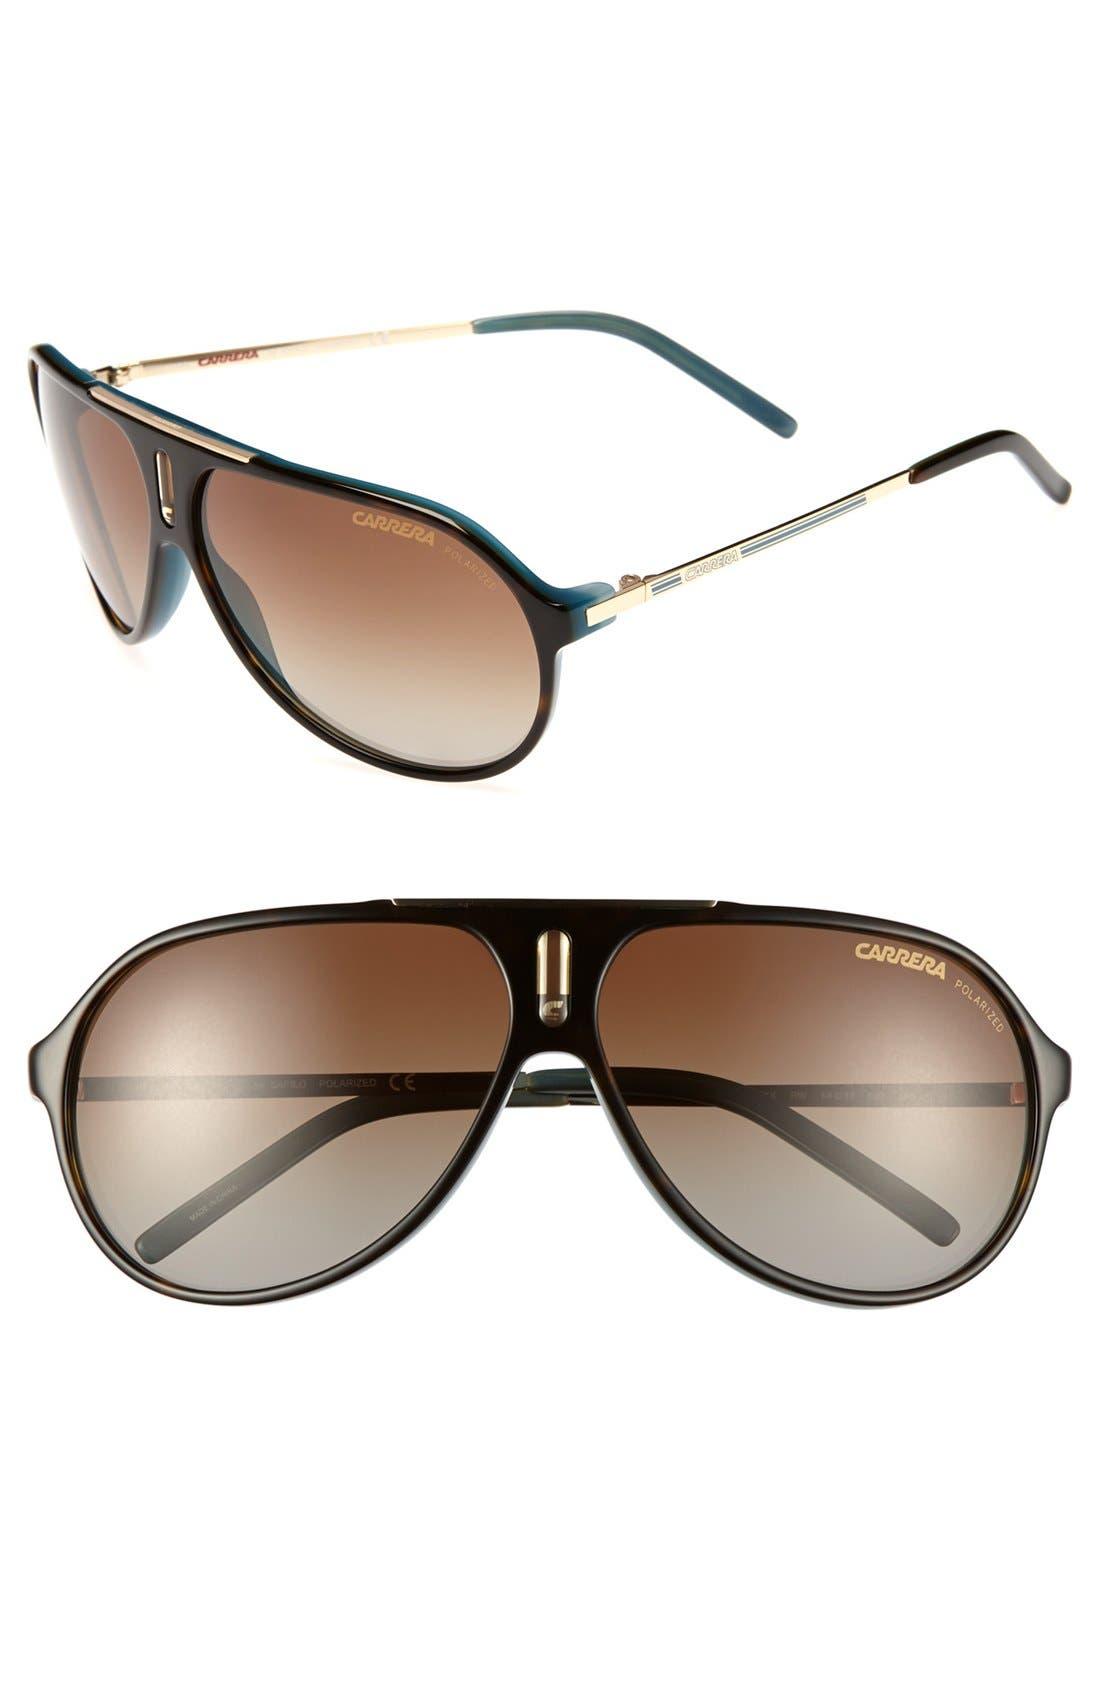 Alternate Image 1 Selected - Carrera Eyewear 'Hot' 64mm Sunglasses